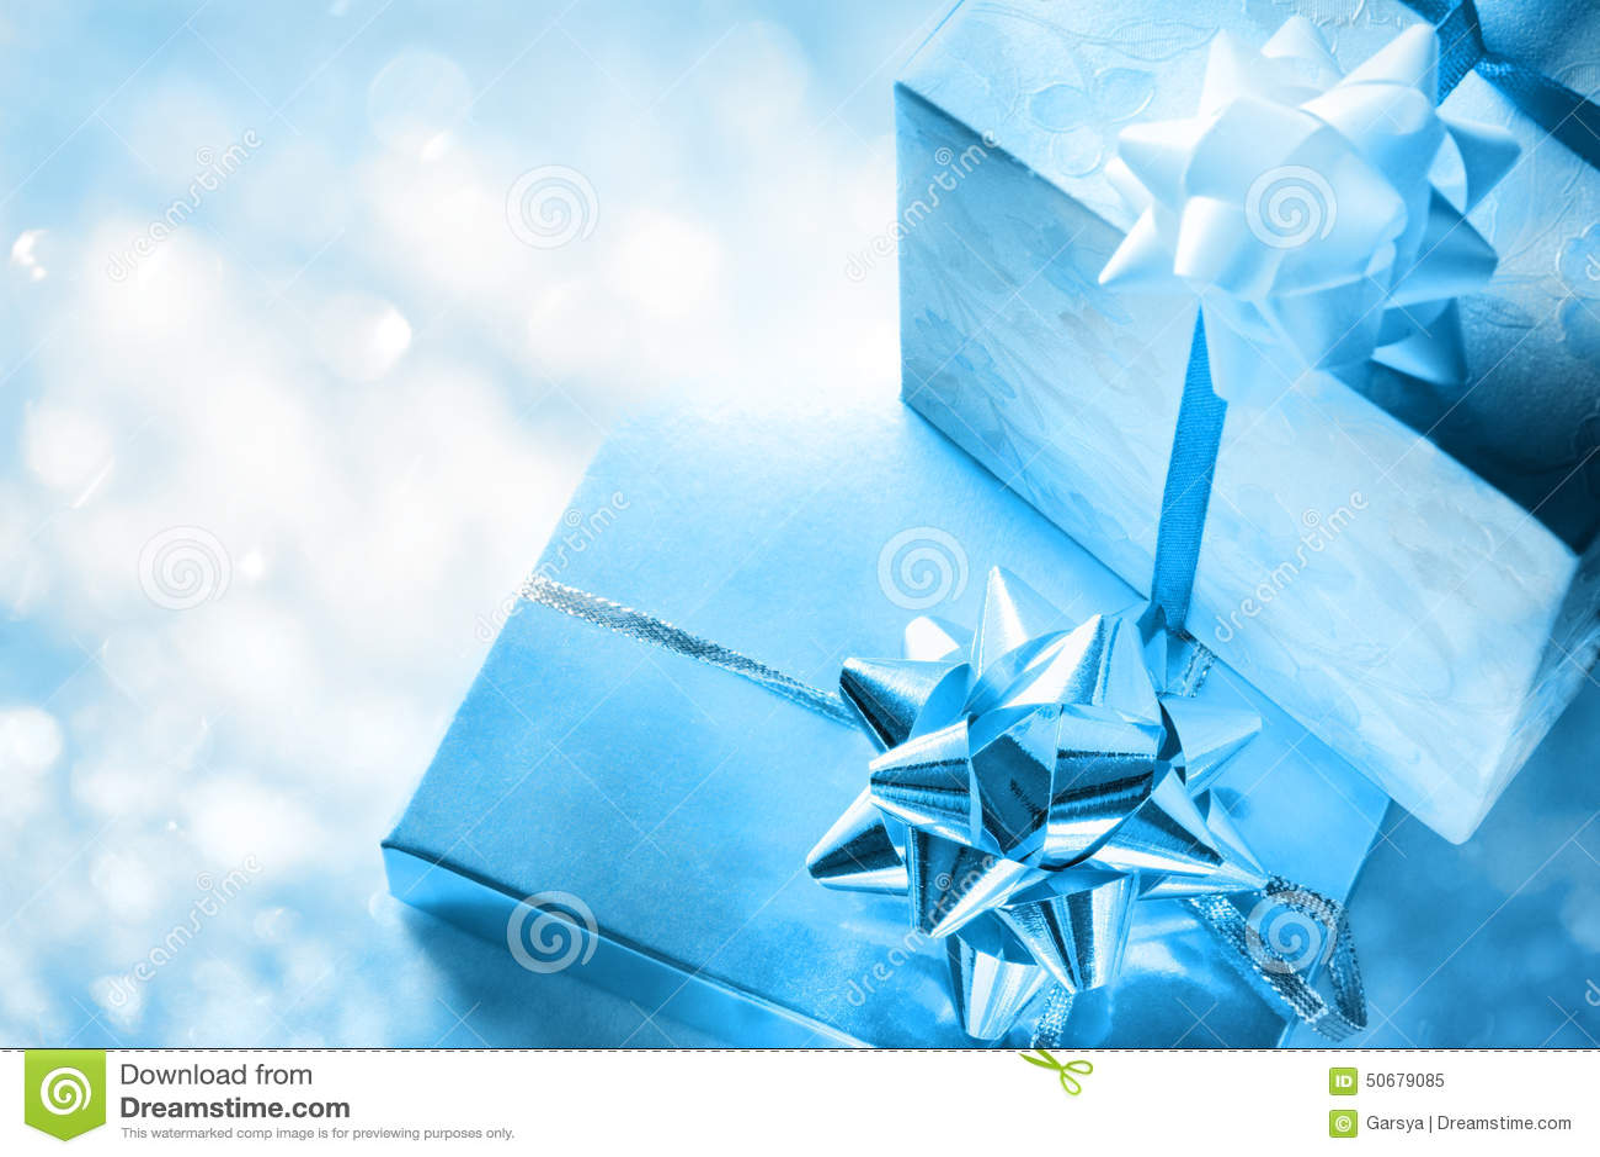 Download 弓把礼品装箱 库存图片. 图片 包括有 丝带, 颜色, 惊奇, 程序包, 唯一, 设计, 存在, 附注, 生日 - 50679085